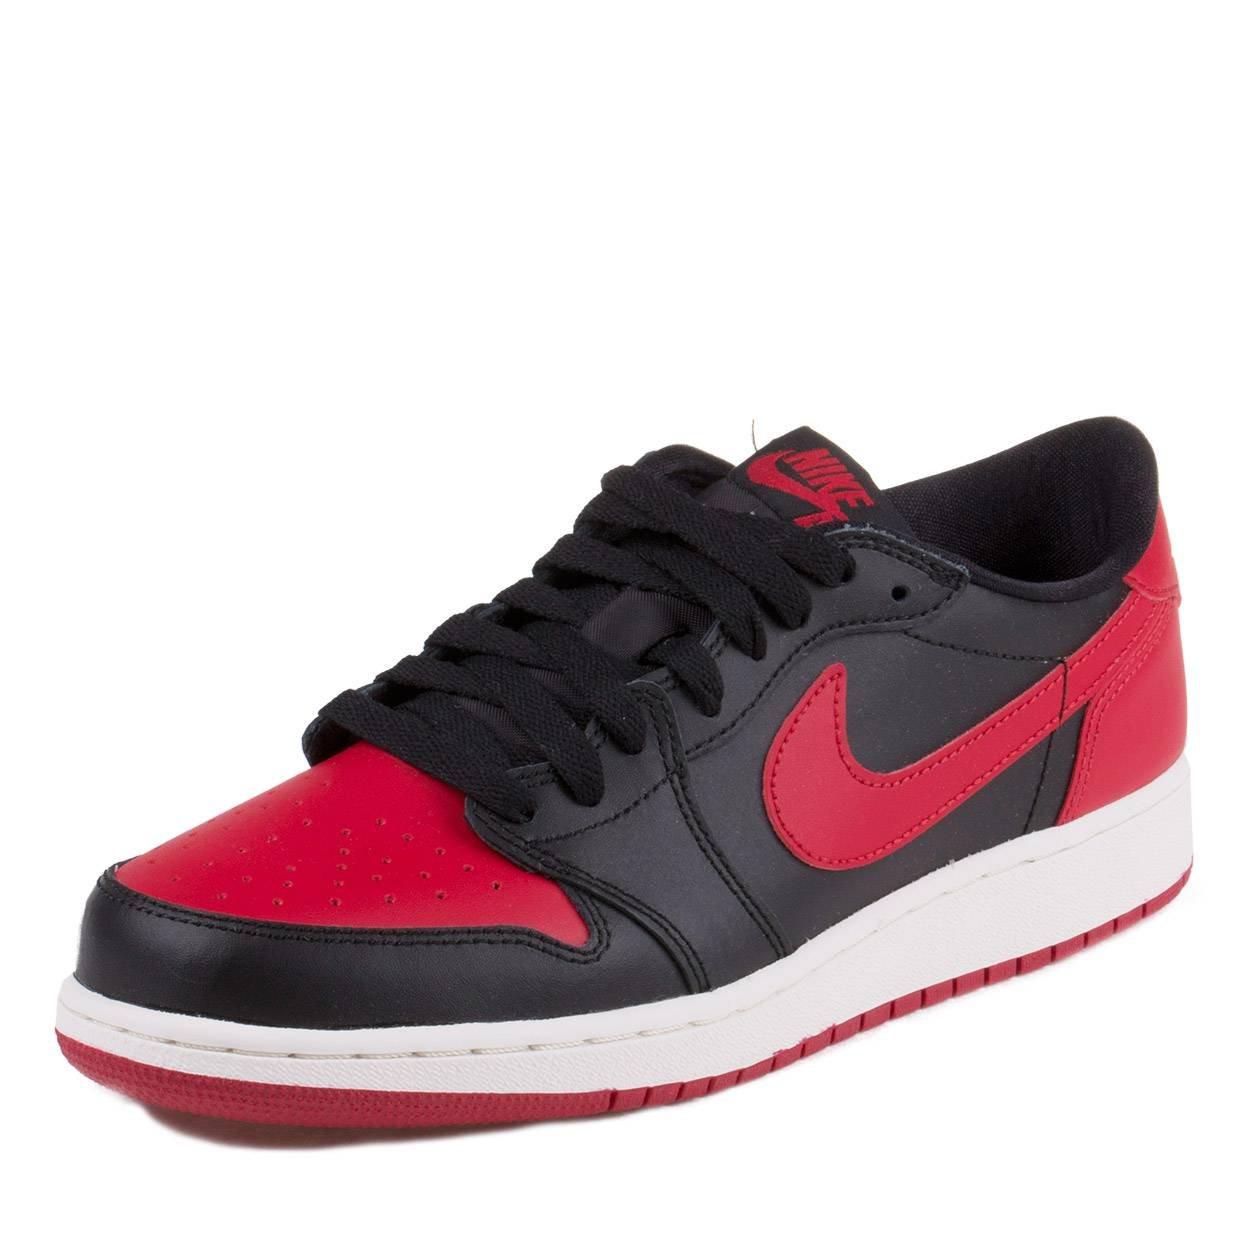 53a0c1bb2a9e9 Galleon - NIKE Mens Air Jordan 1 Retro Low BG Bred Black Varsity Red-Sail  Leather Size 7Y Basketball Shoes